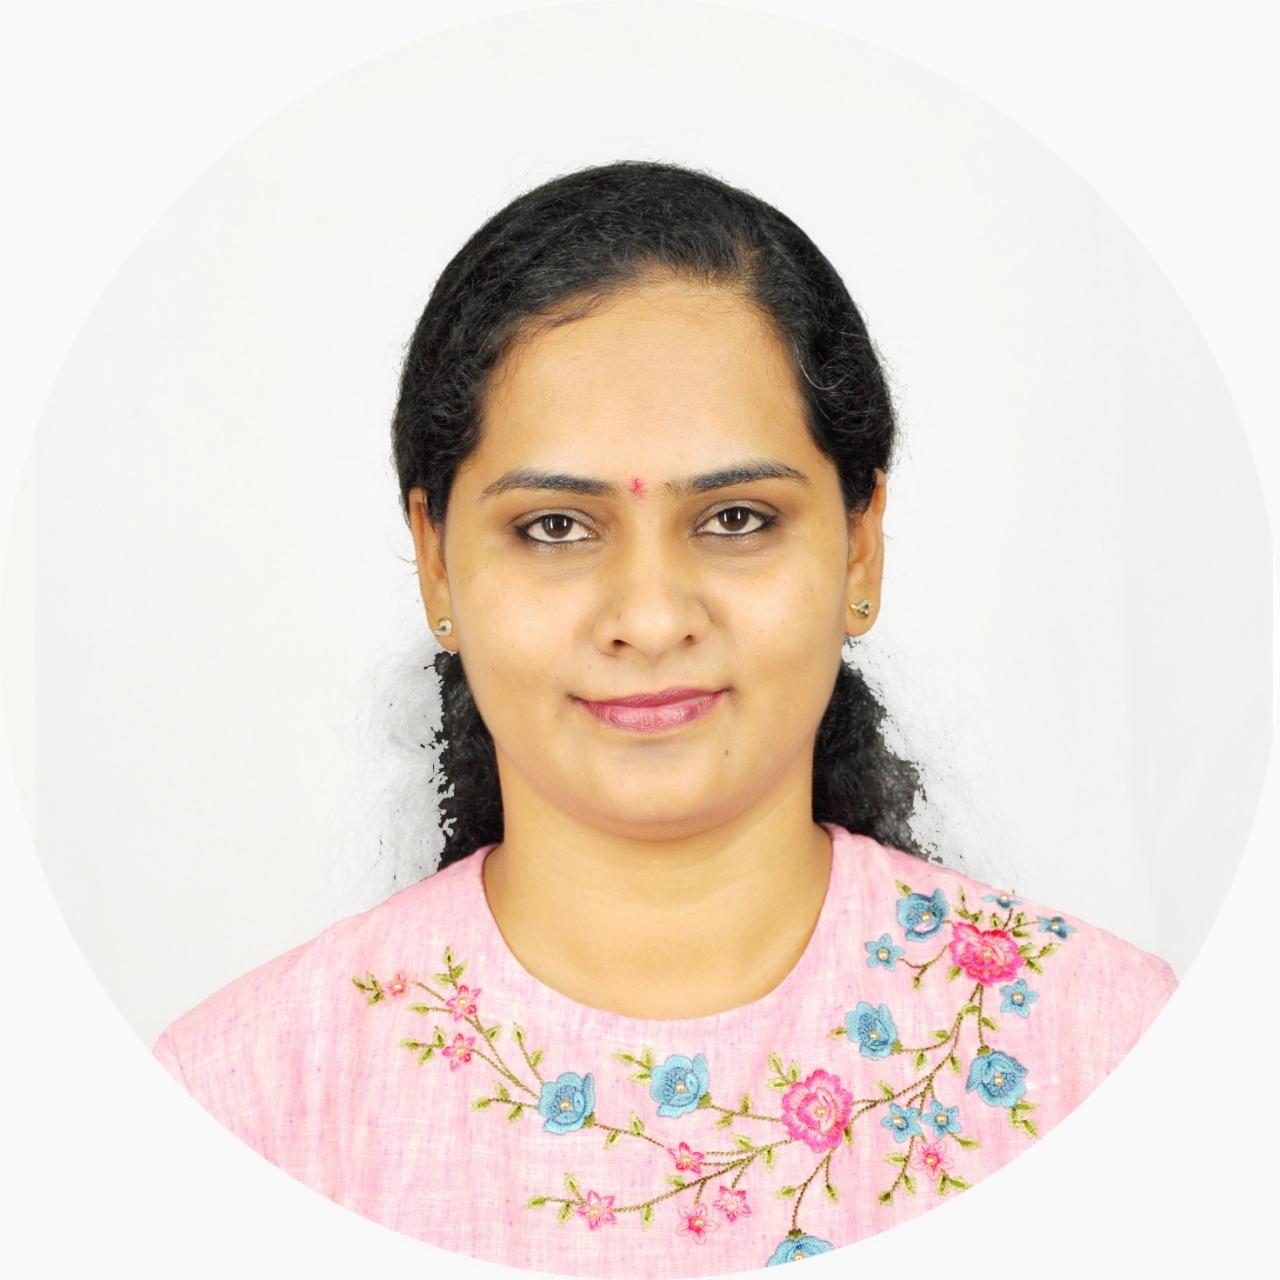 Mrunalini Khot